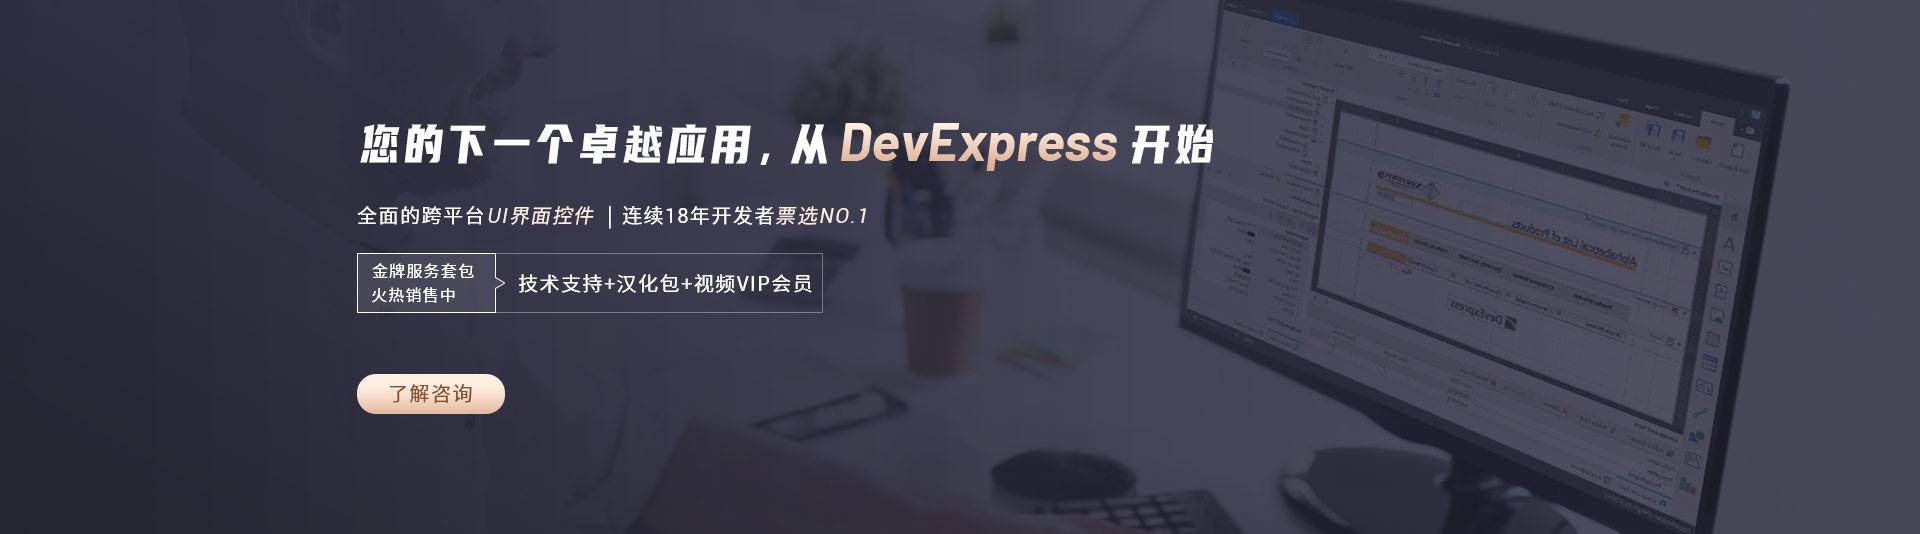 DevExpress金牌套包火热销售中 - 慧都网